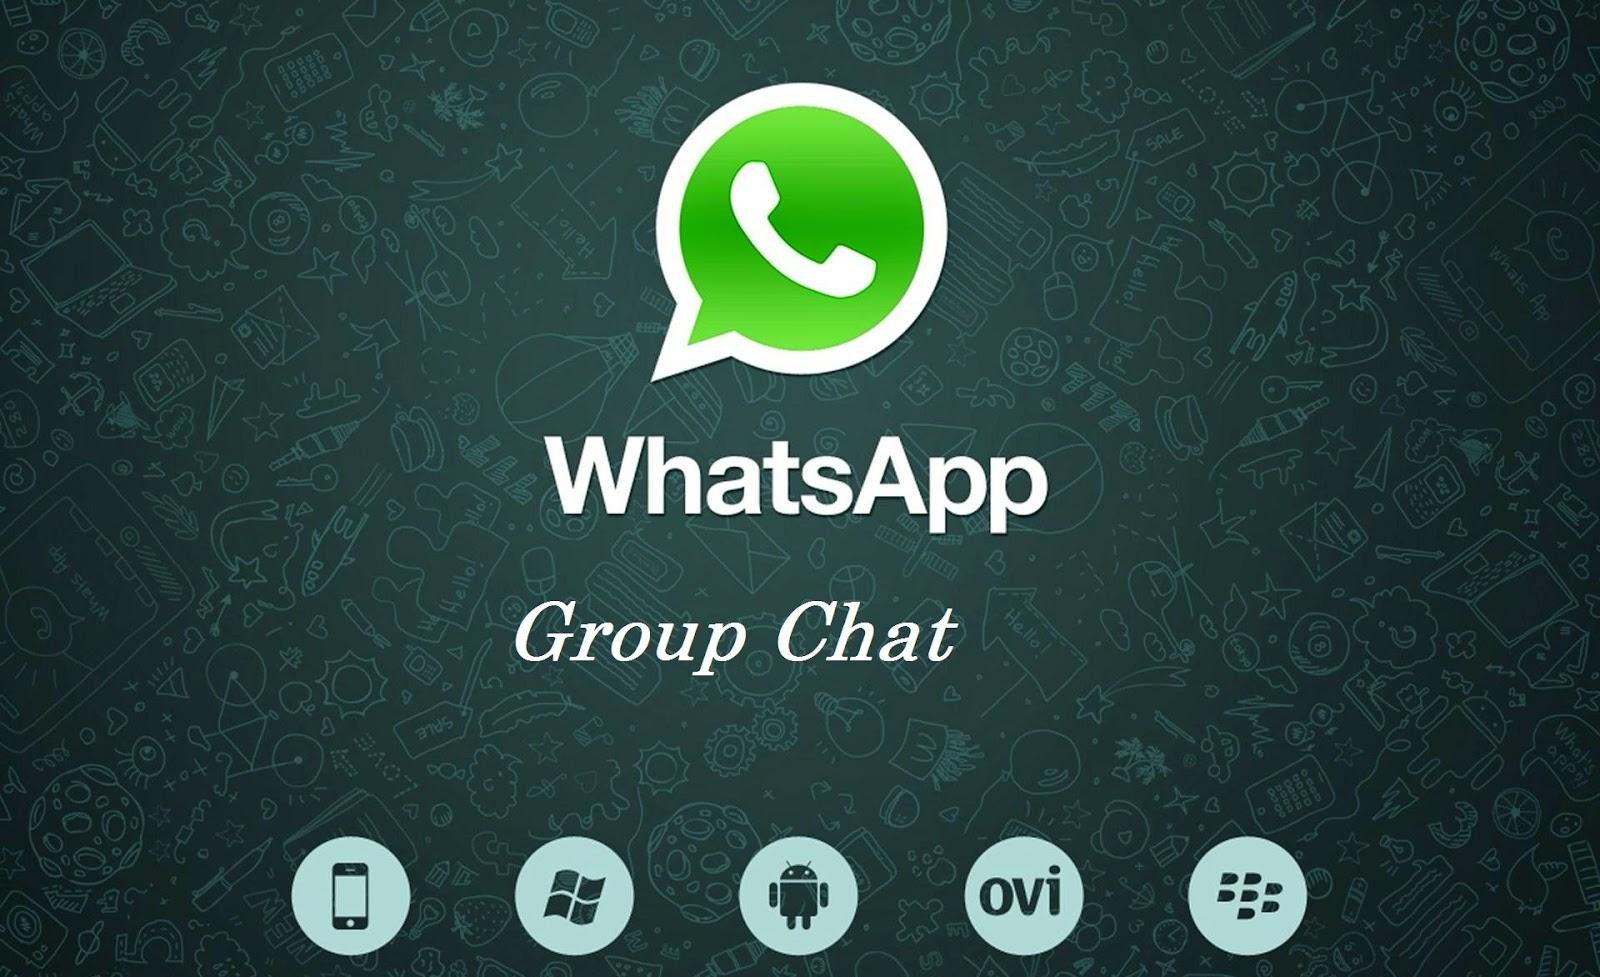 whatsapp secret adult chat group posts